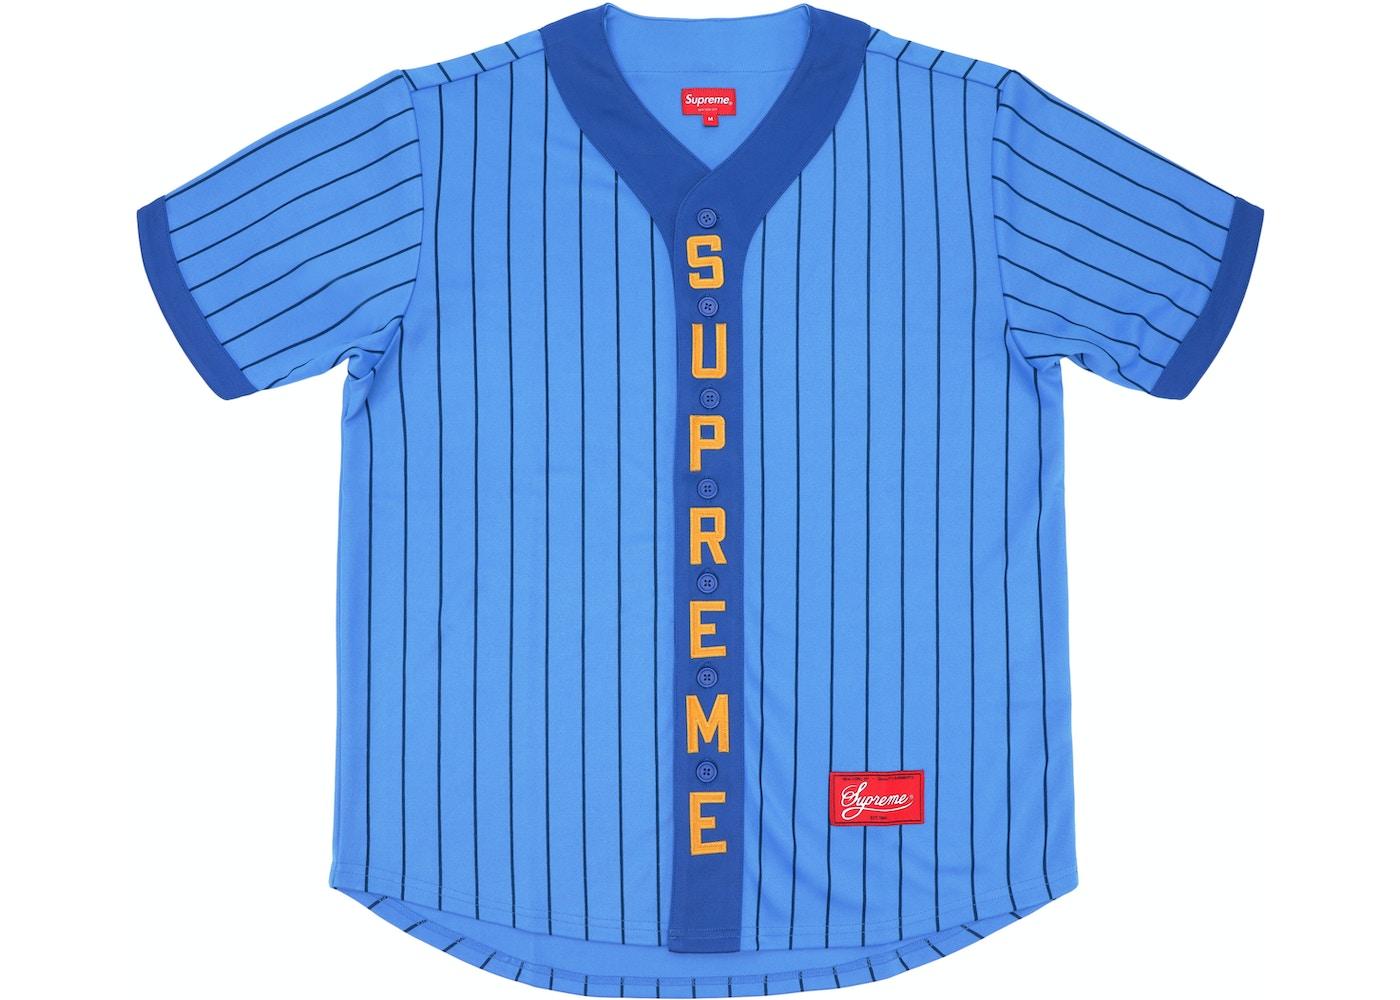 efb7f7e2303 Supreme Vertical Logo Baseball Jersey Blue Yellow - FW18